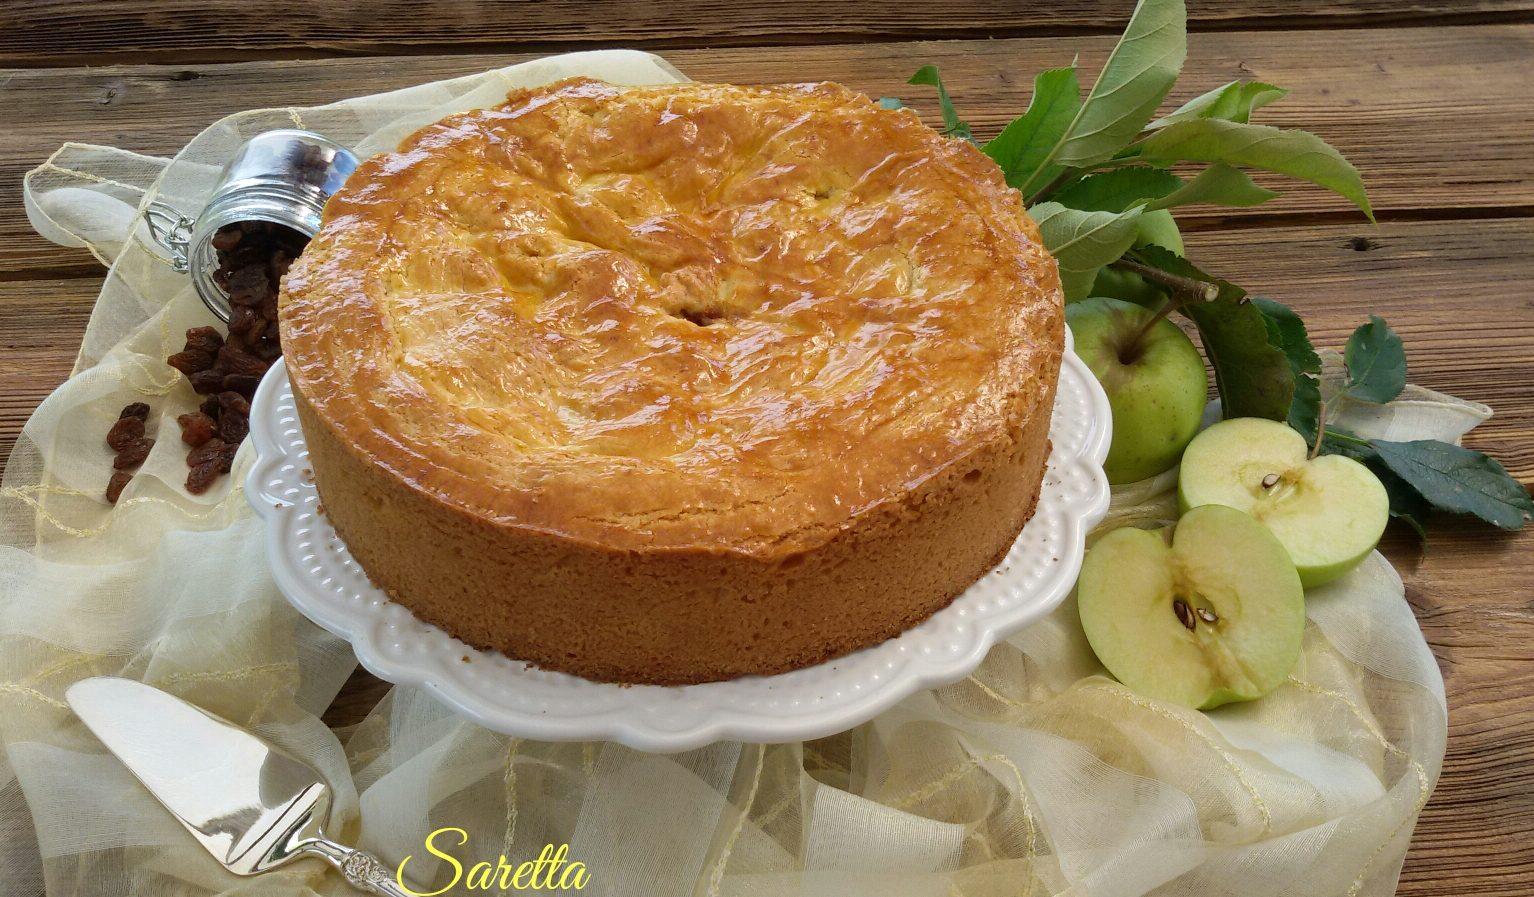 Ricetta Torta Di Mele Bake Off Italia.Crostata Rivisitata Di Ernst Knam Bake Off Italia 2017 Cucina Con Saretta